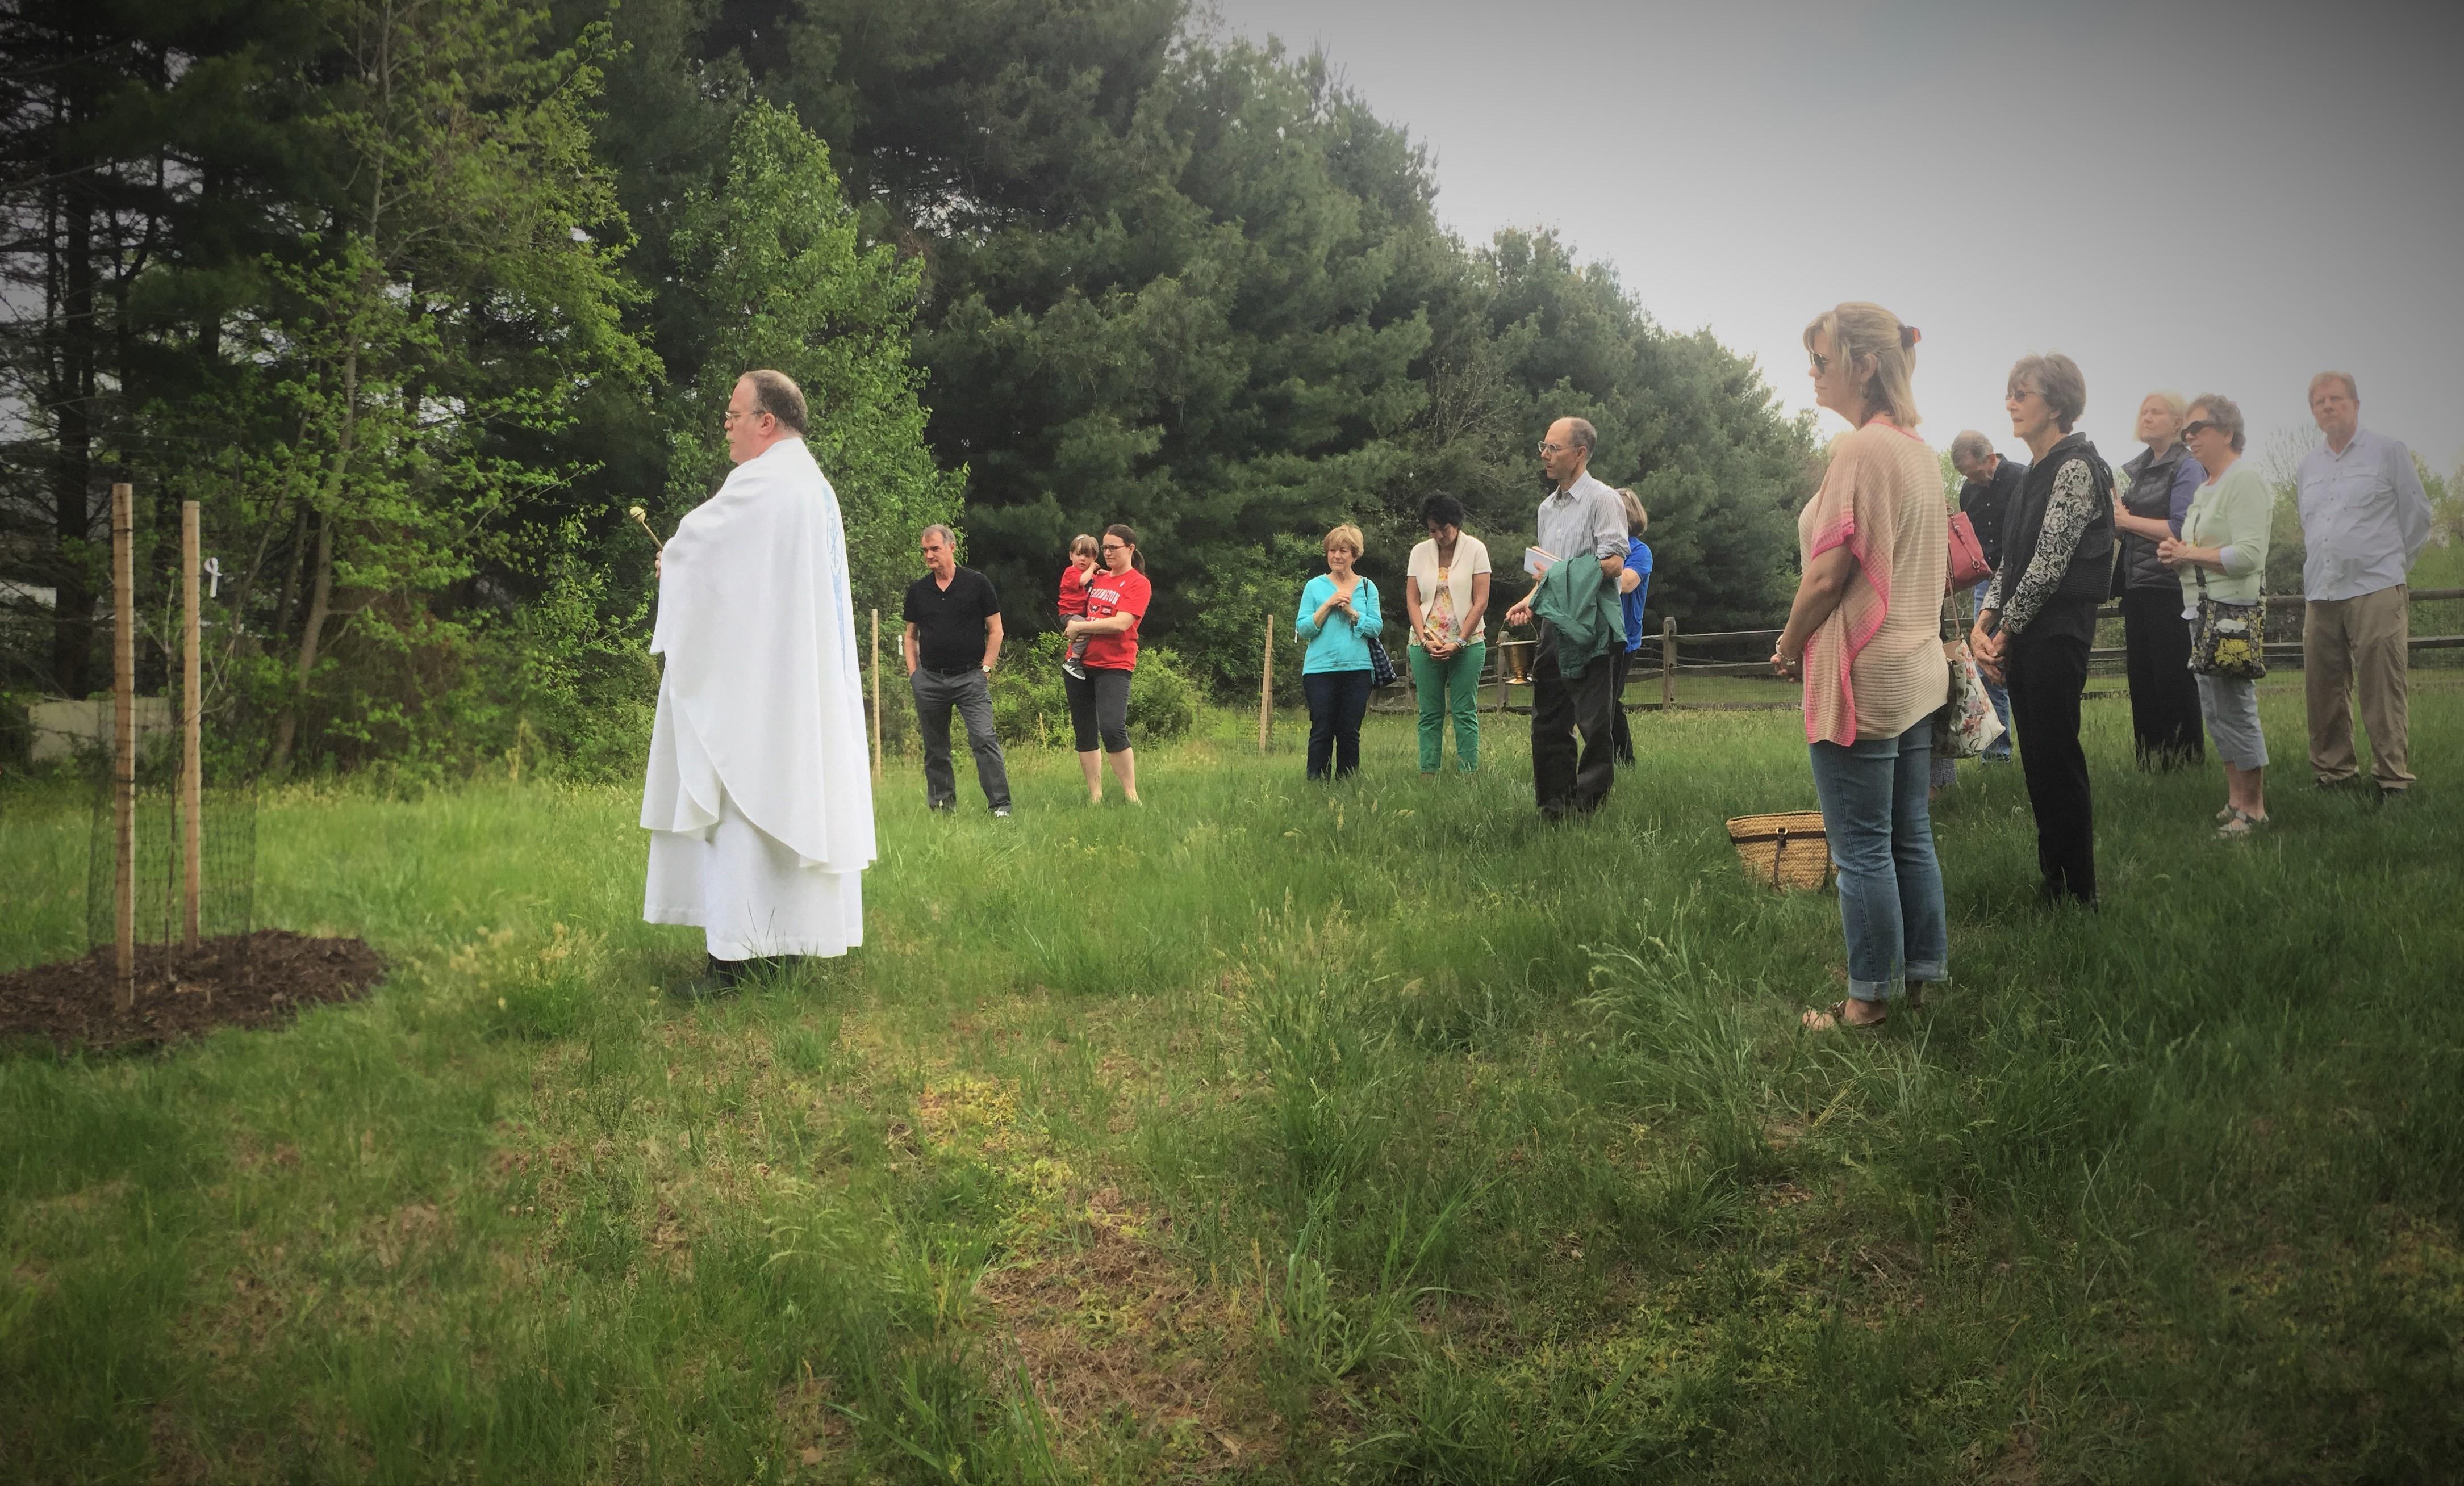 Tree_Blessing_at_Holy_Family_Catholic.JPG